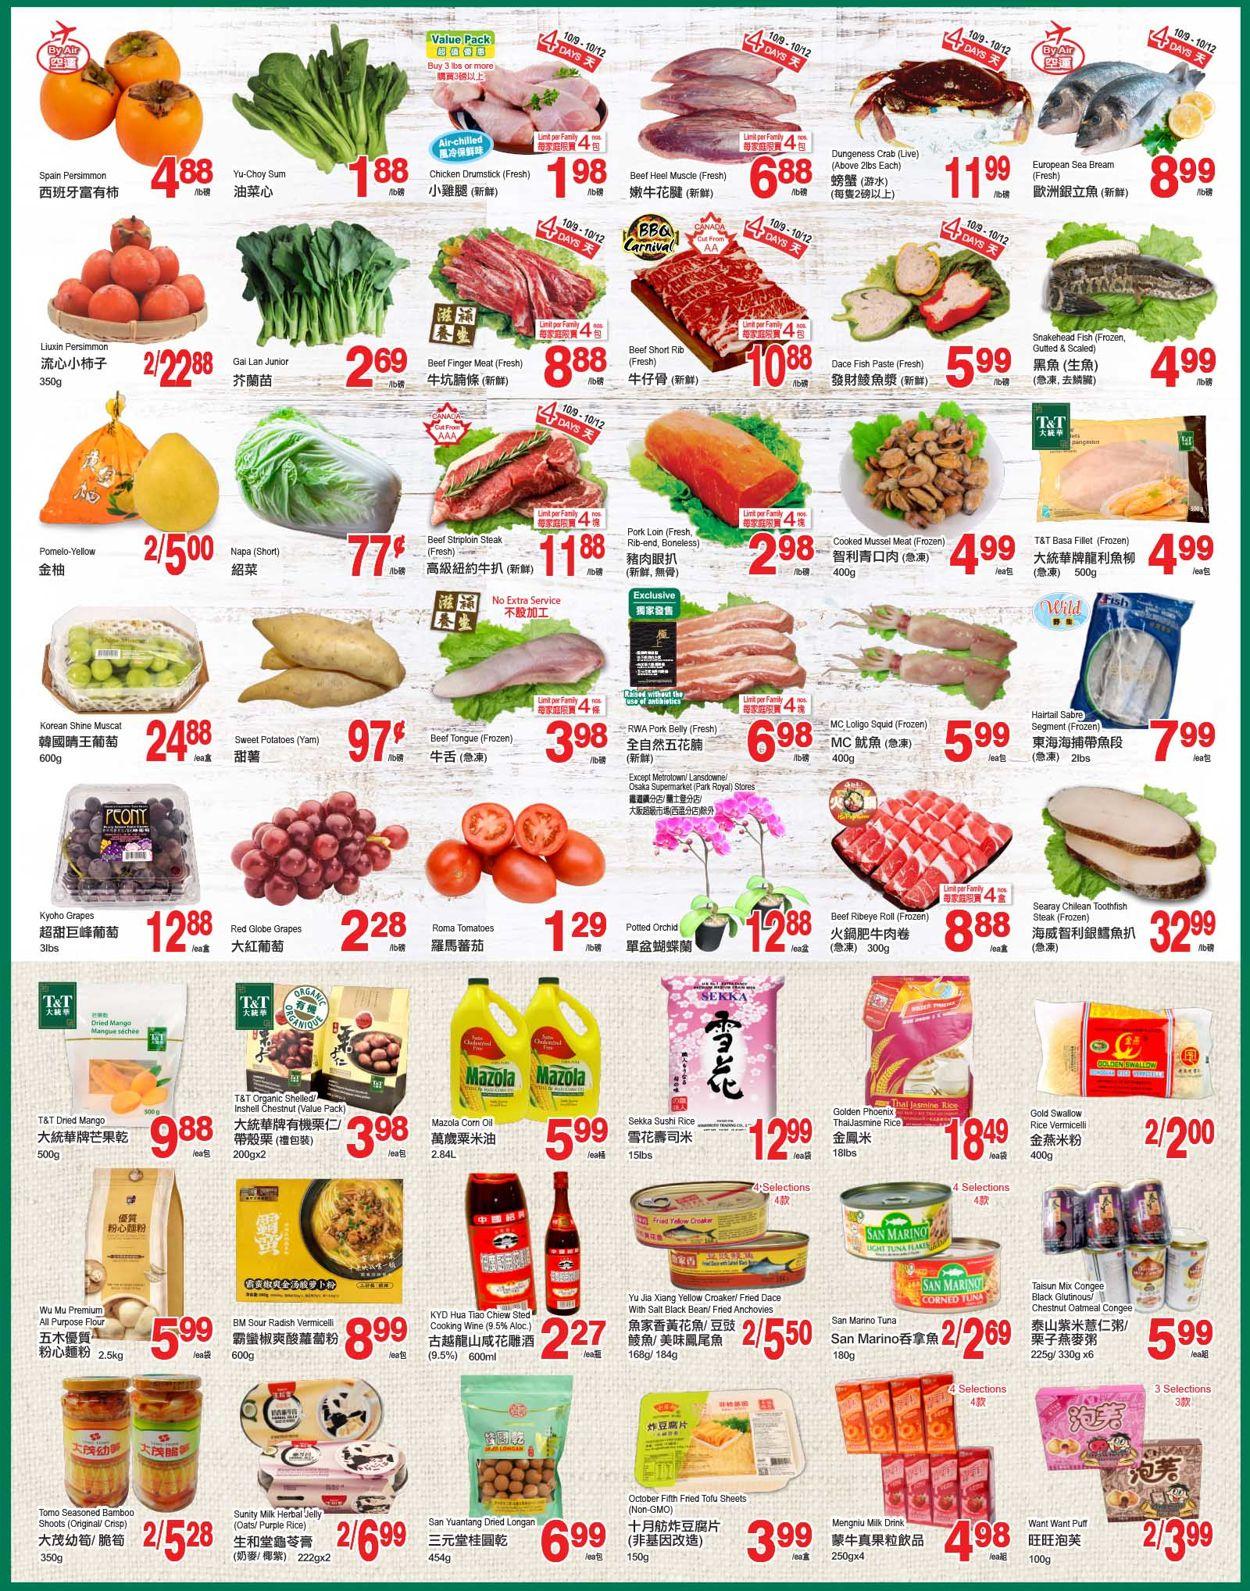 T&T Supermarket - British Columbia Flyer - 10/09-10/15/2020 (Page 2)